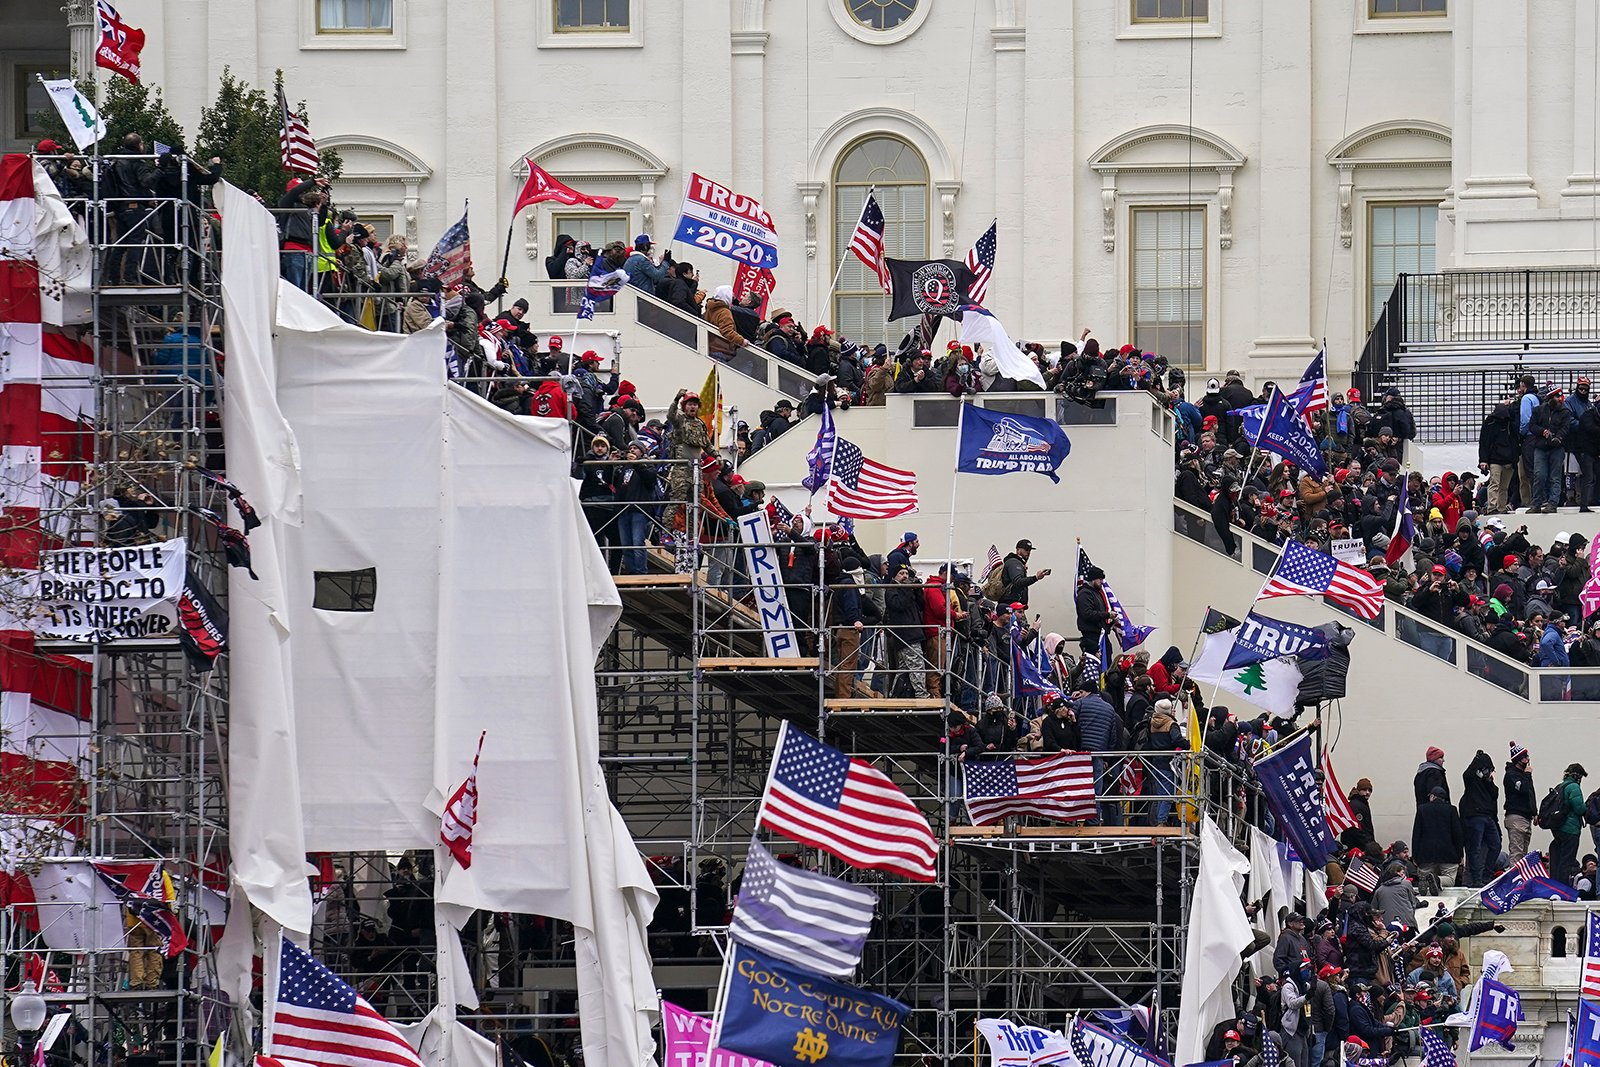 Trump supporters climb inauguration scaffolding outside the Capitol on Jan. 6, 2021, in Washington. (AP Photo/John Minchillo)